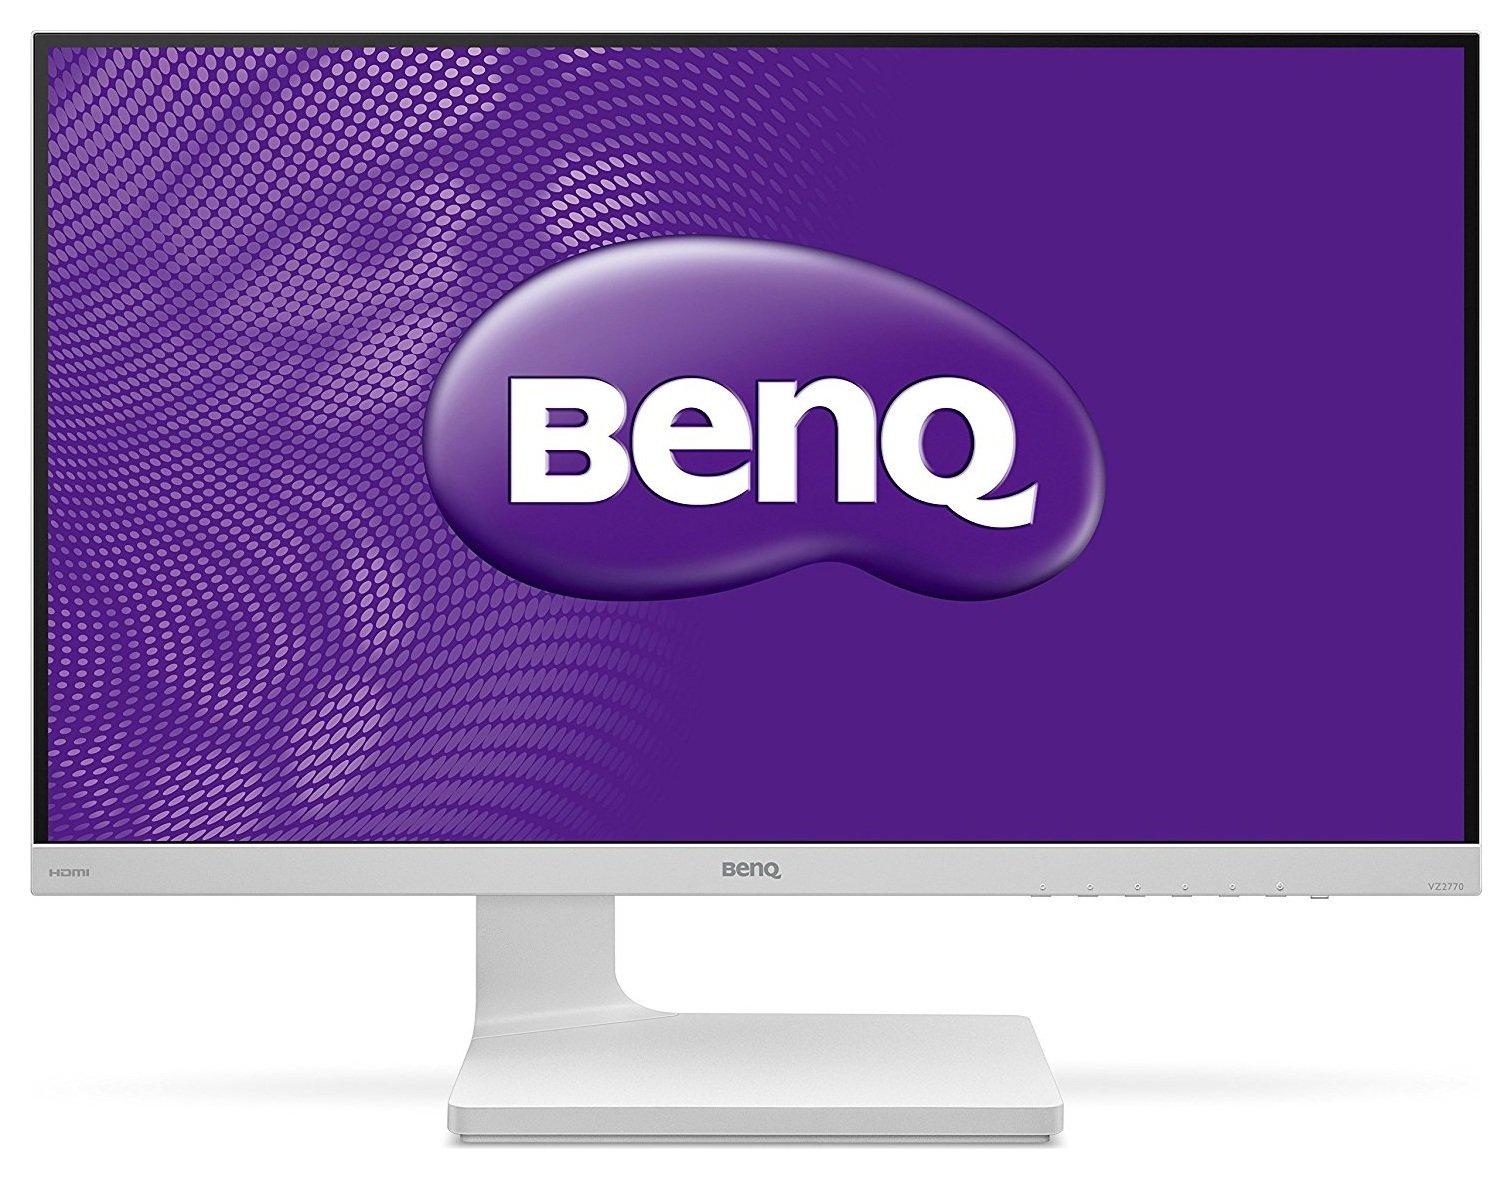 Image of Benq VZ2770H LED 27 Inch Monitor.